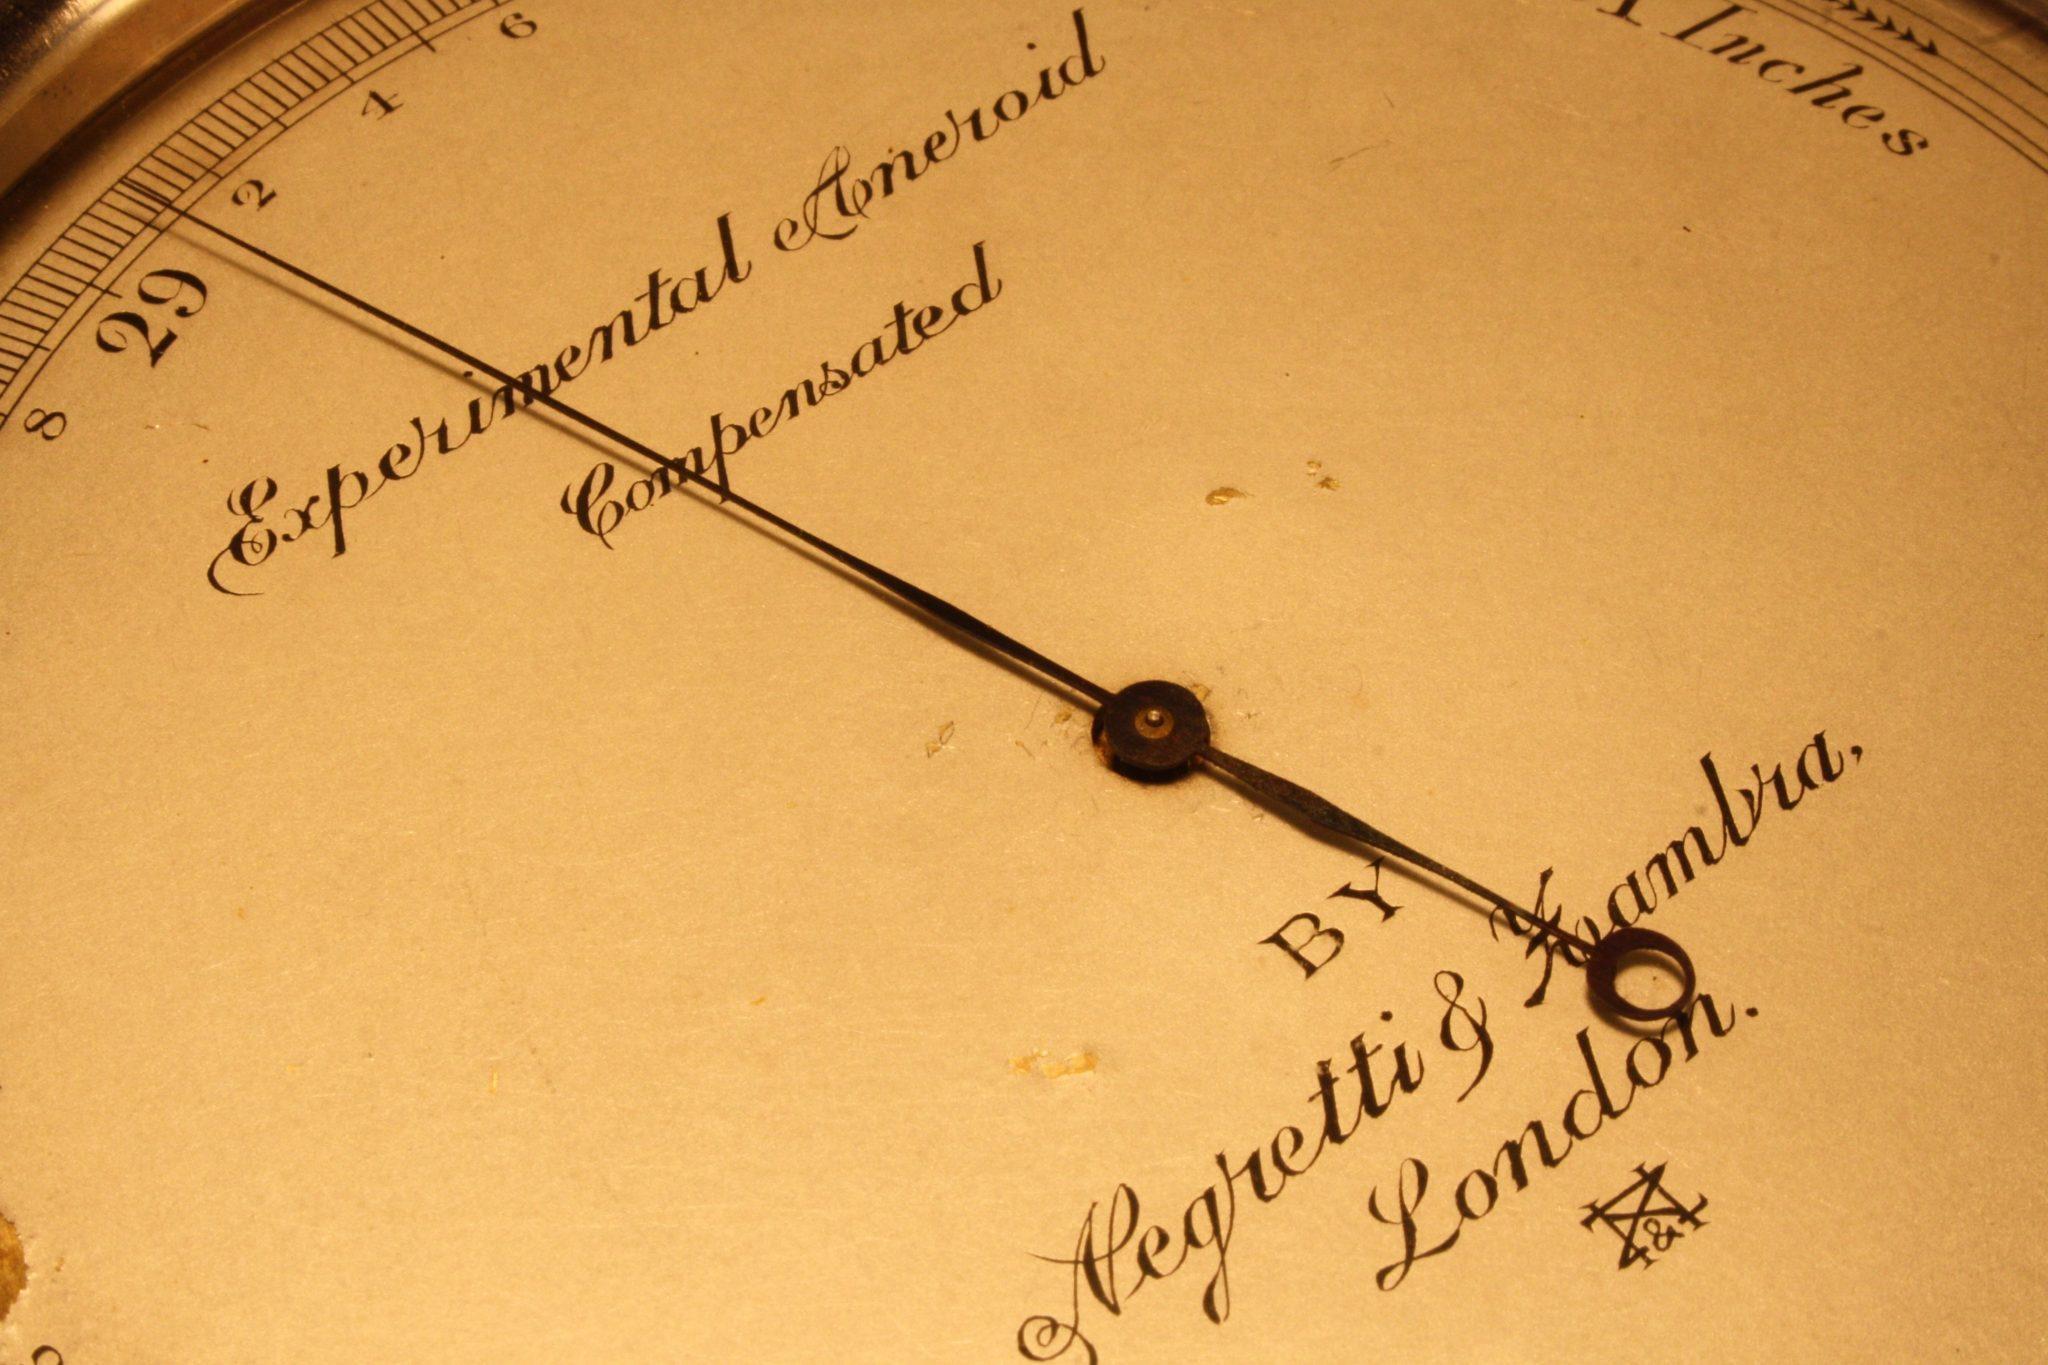 Image of Experimental Aneroid Barometer by Negretti & Zambra c1920